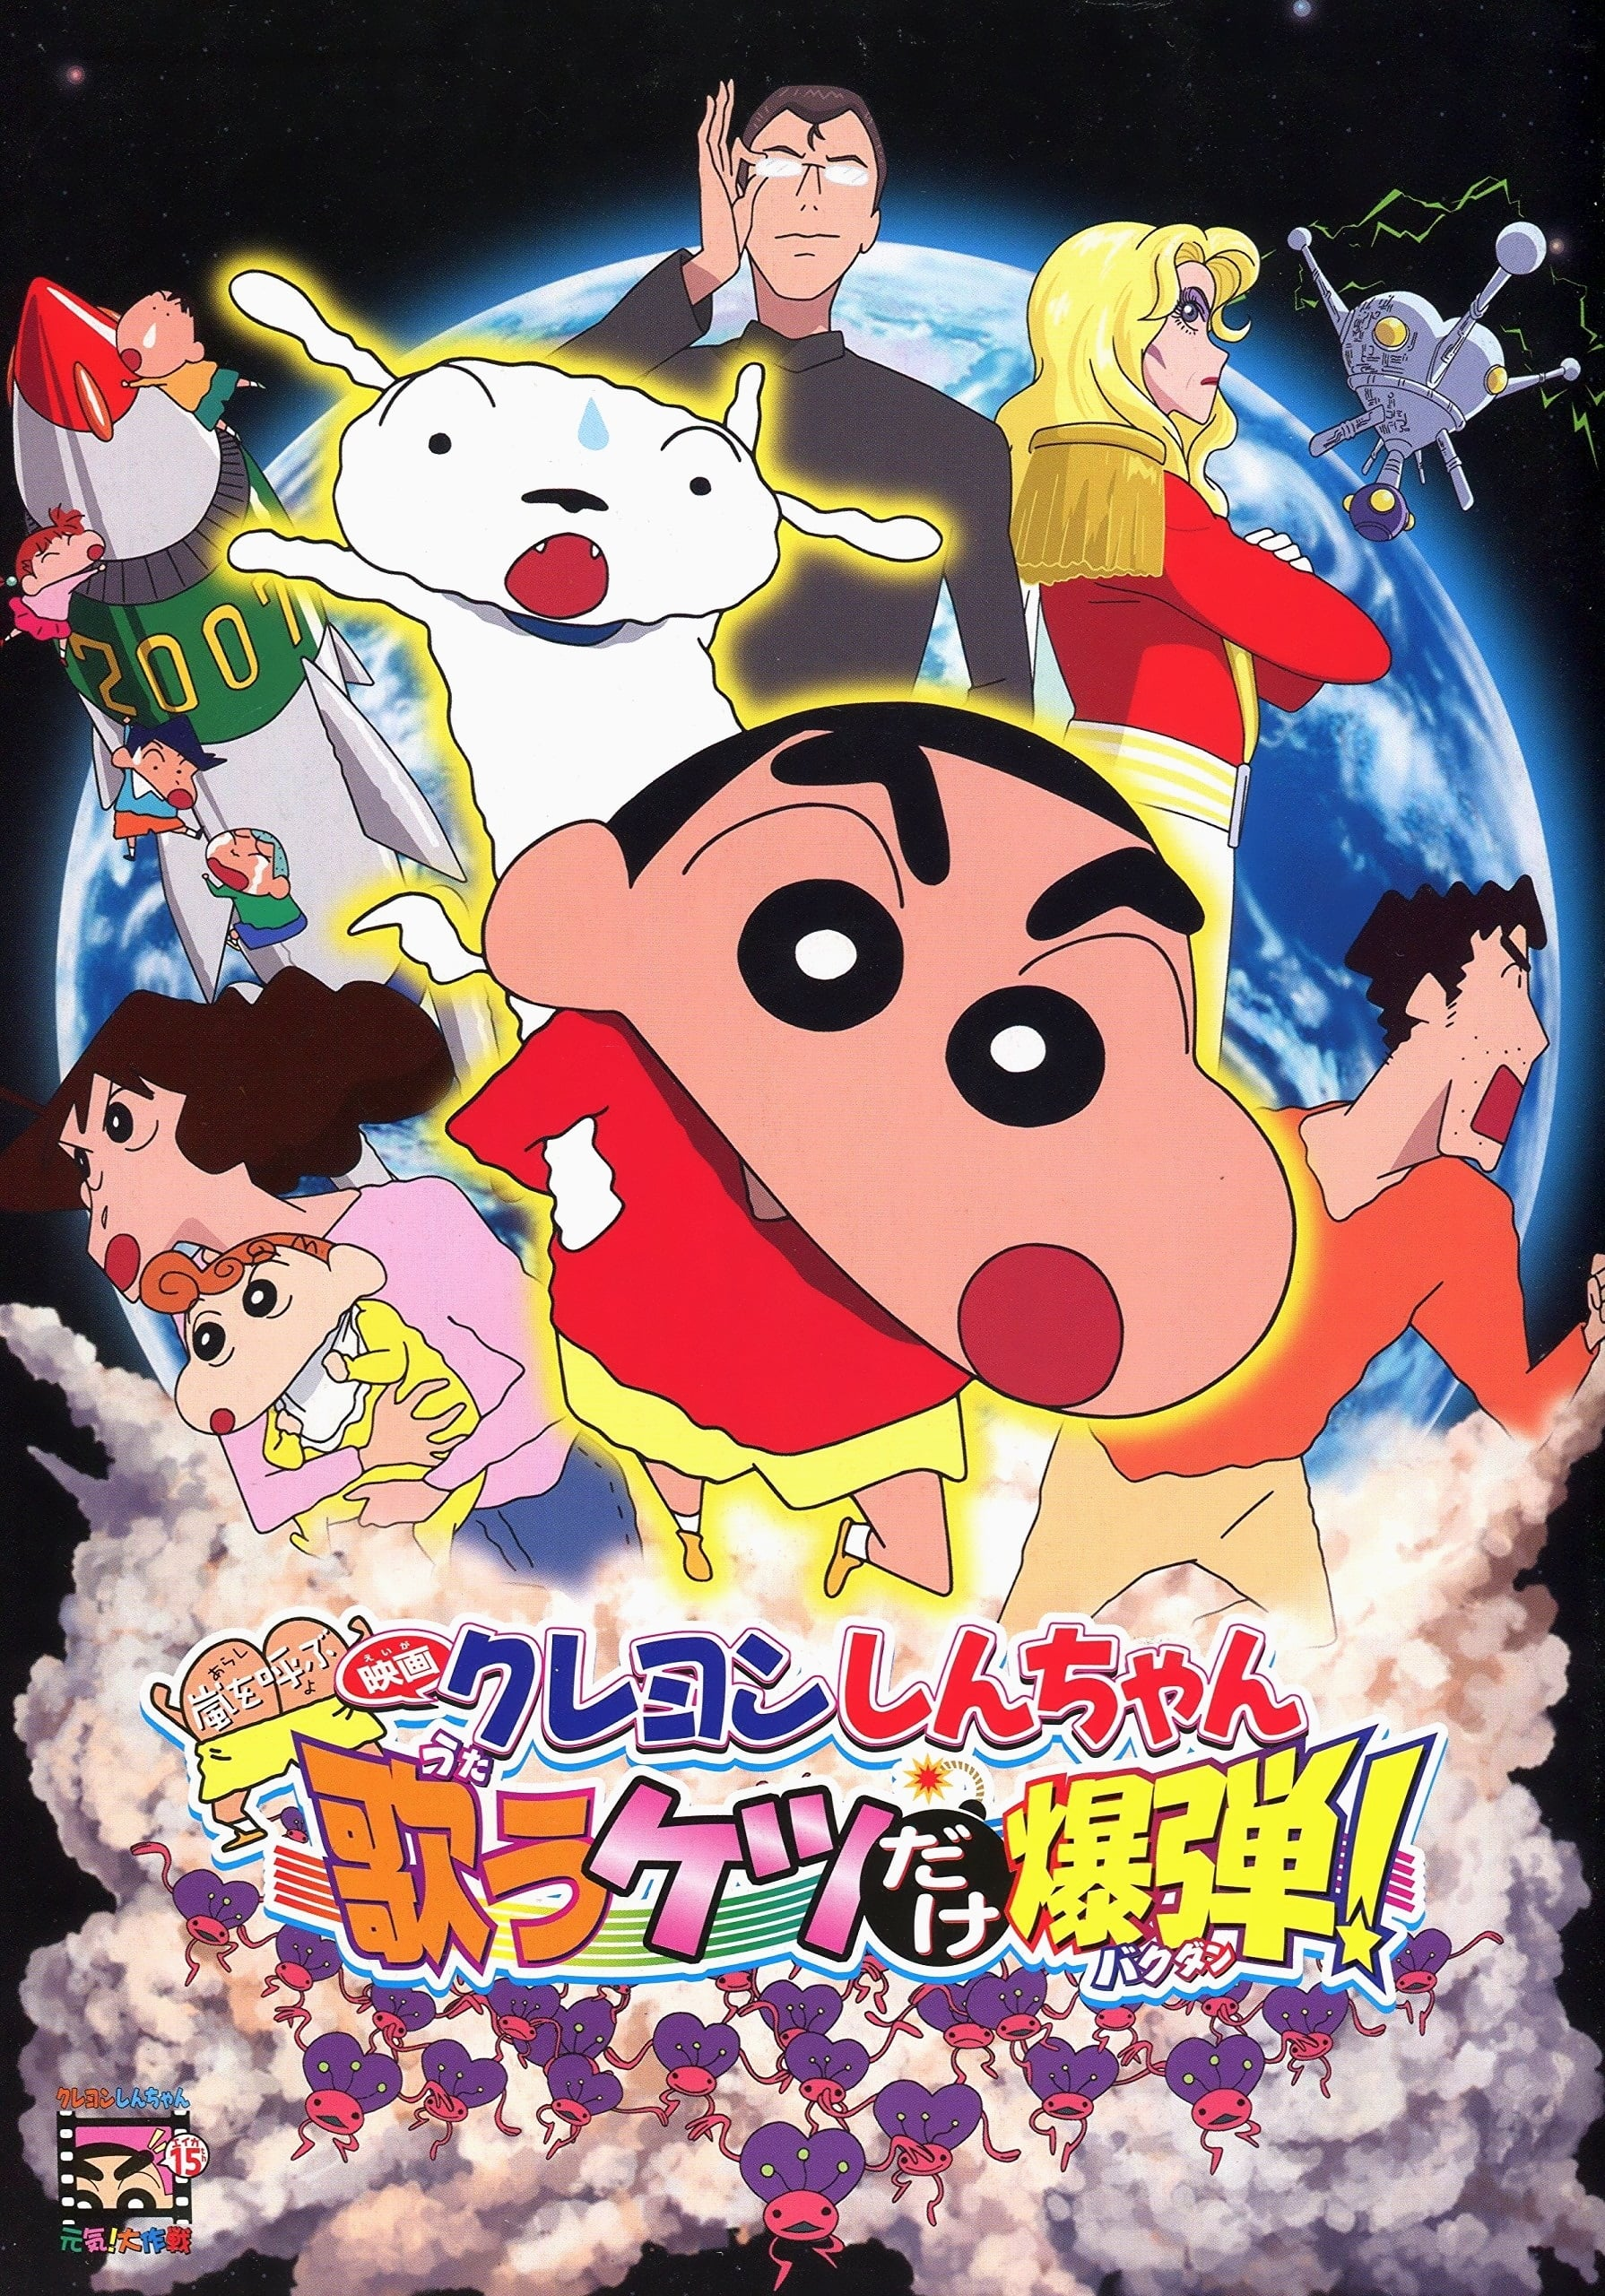 Crayon Shin-chan: Fierceness That Invites Storm! The Singing Buttocks Bomb (2007)